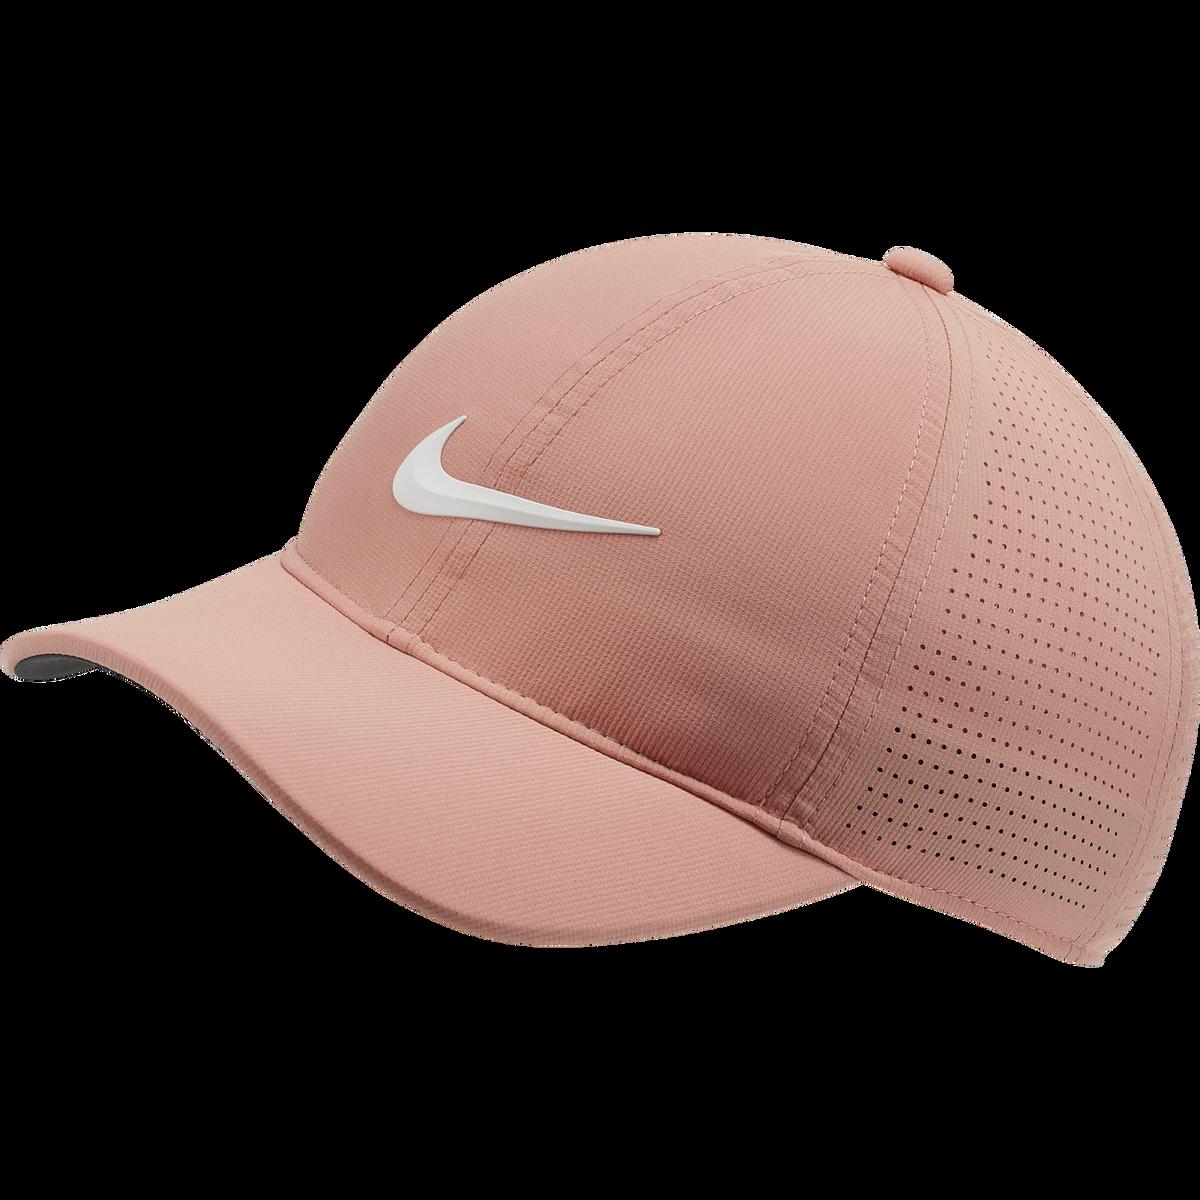 fdca5f24e Nike AeroBill Legacy91 Women's Golf Hat | PGA TOUR Superstore